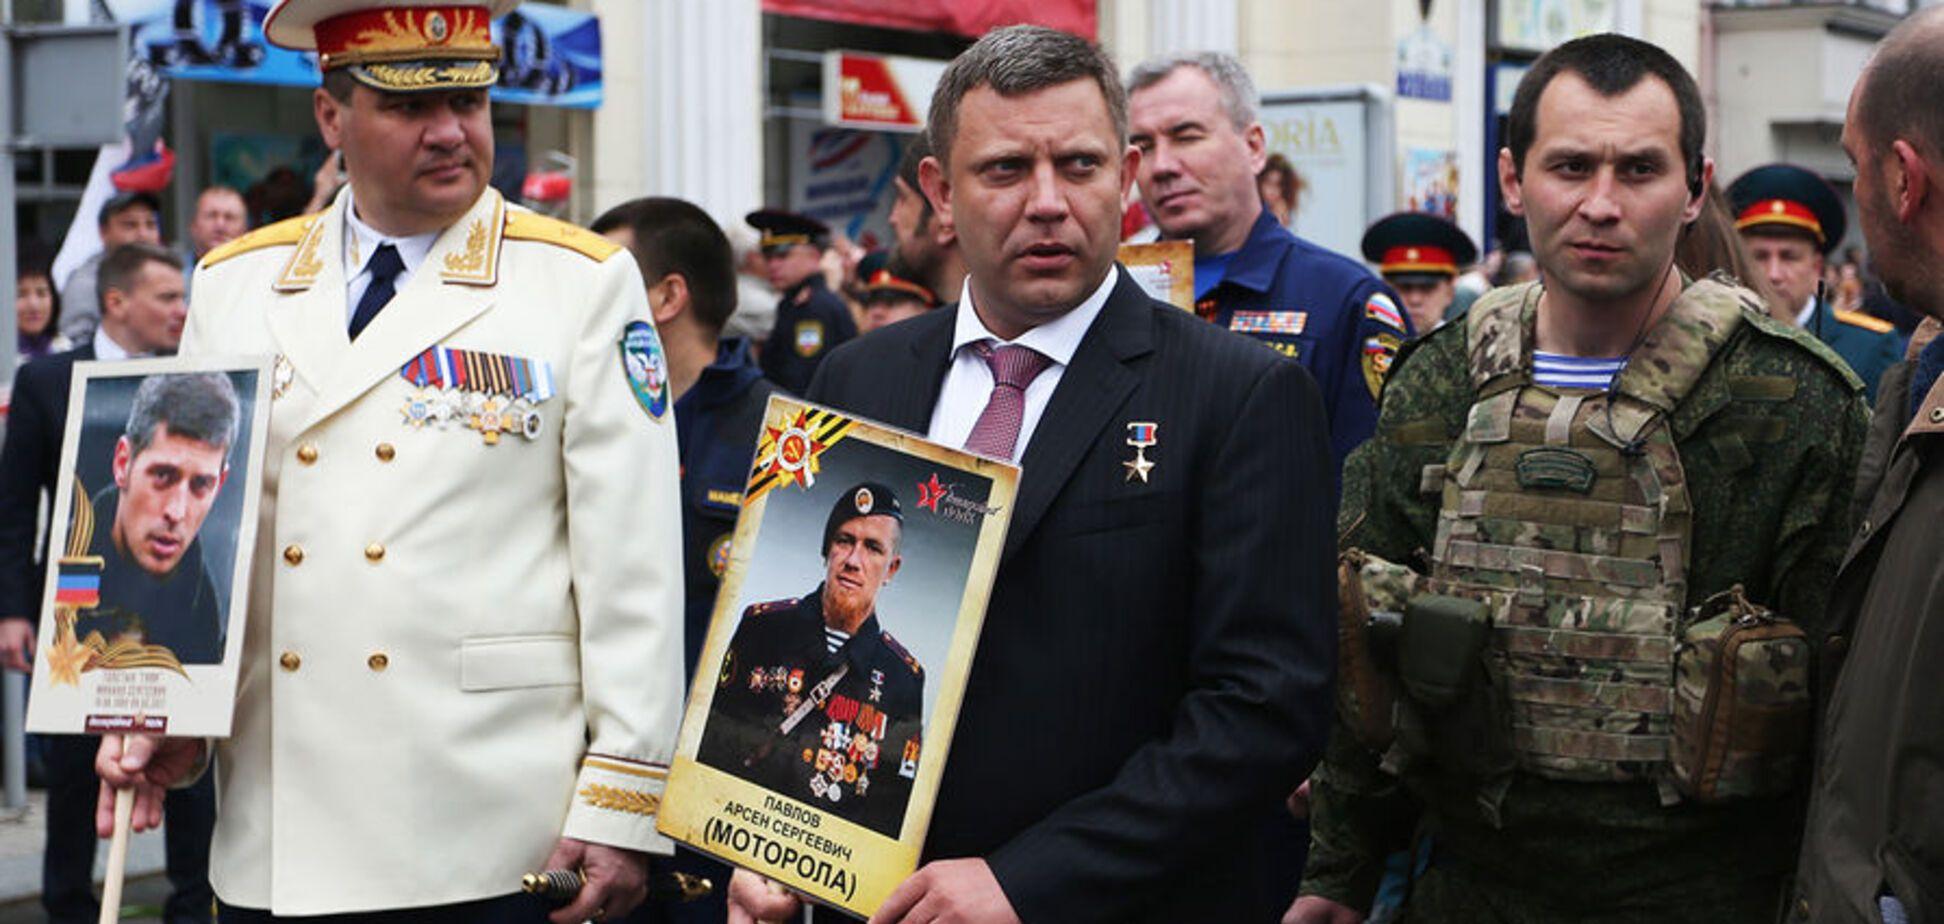 'Просто поднимись на 6 этаж': украинский артиллерист поглумился над Захарченко